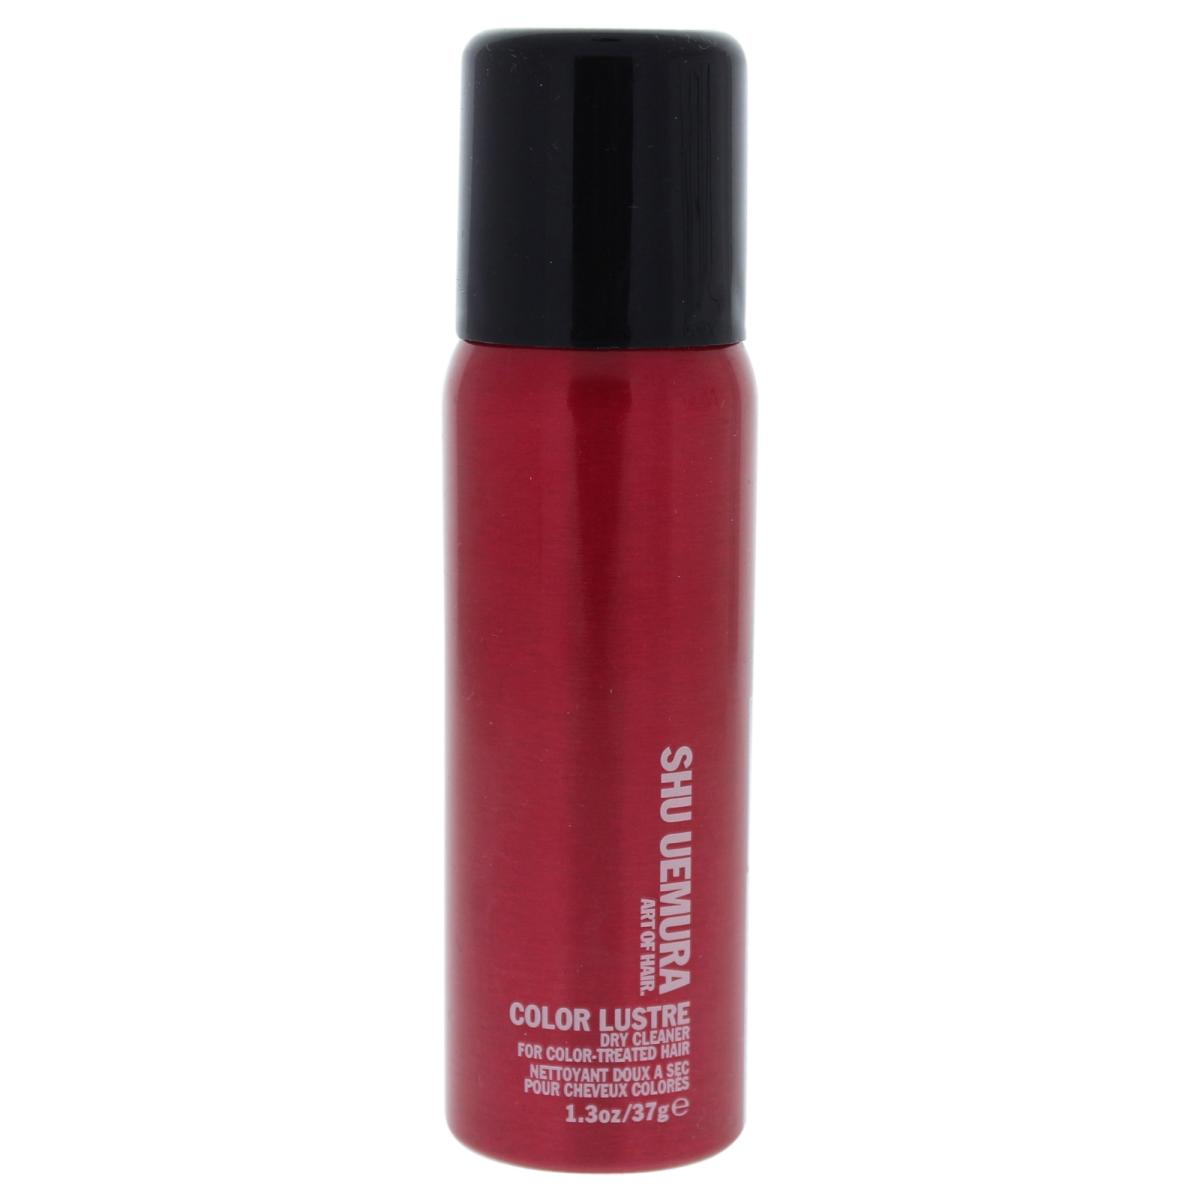 Shu Uemura U-HC-12029 1.3 oz Color Lustre Dry Cleaner for Color-Treated Hair Shampoo for Unisex